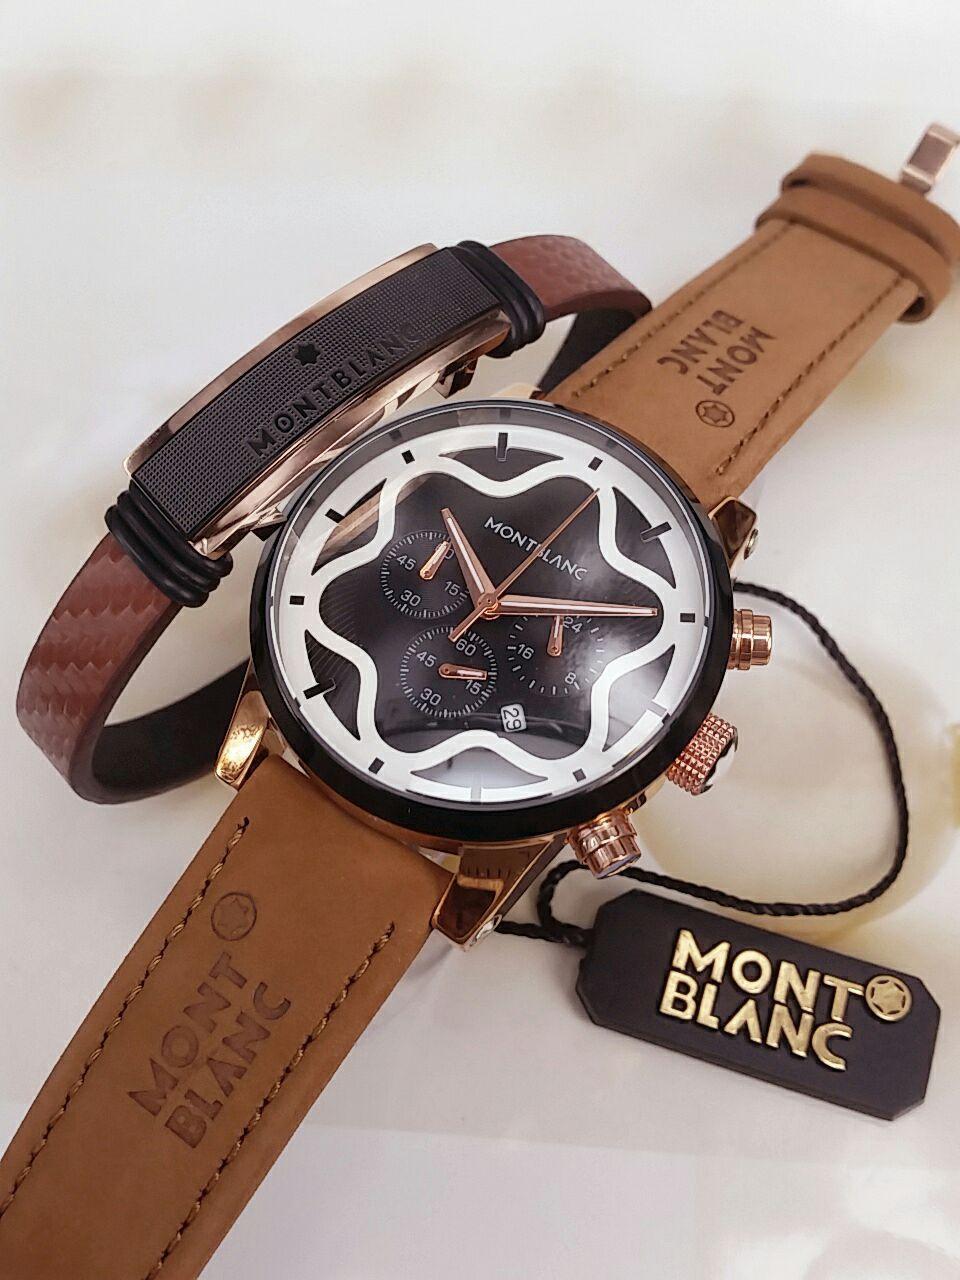 لطلب واتس اب 0543221247 طقم ساعات من ماركة مونت بلان ساعه وسواره جلد طيبيعي 280 الحبه حبتين 500 ريال Fashion Watches Leather Leather Watch